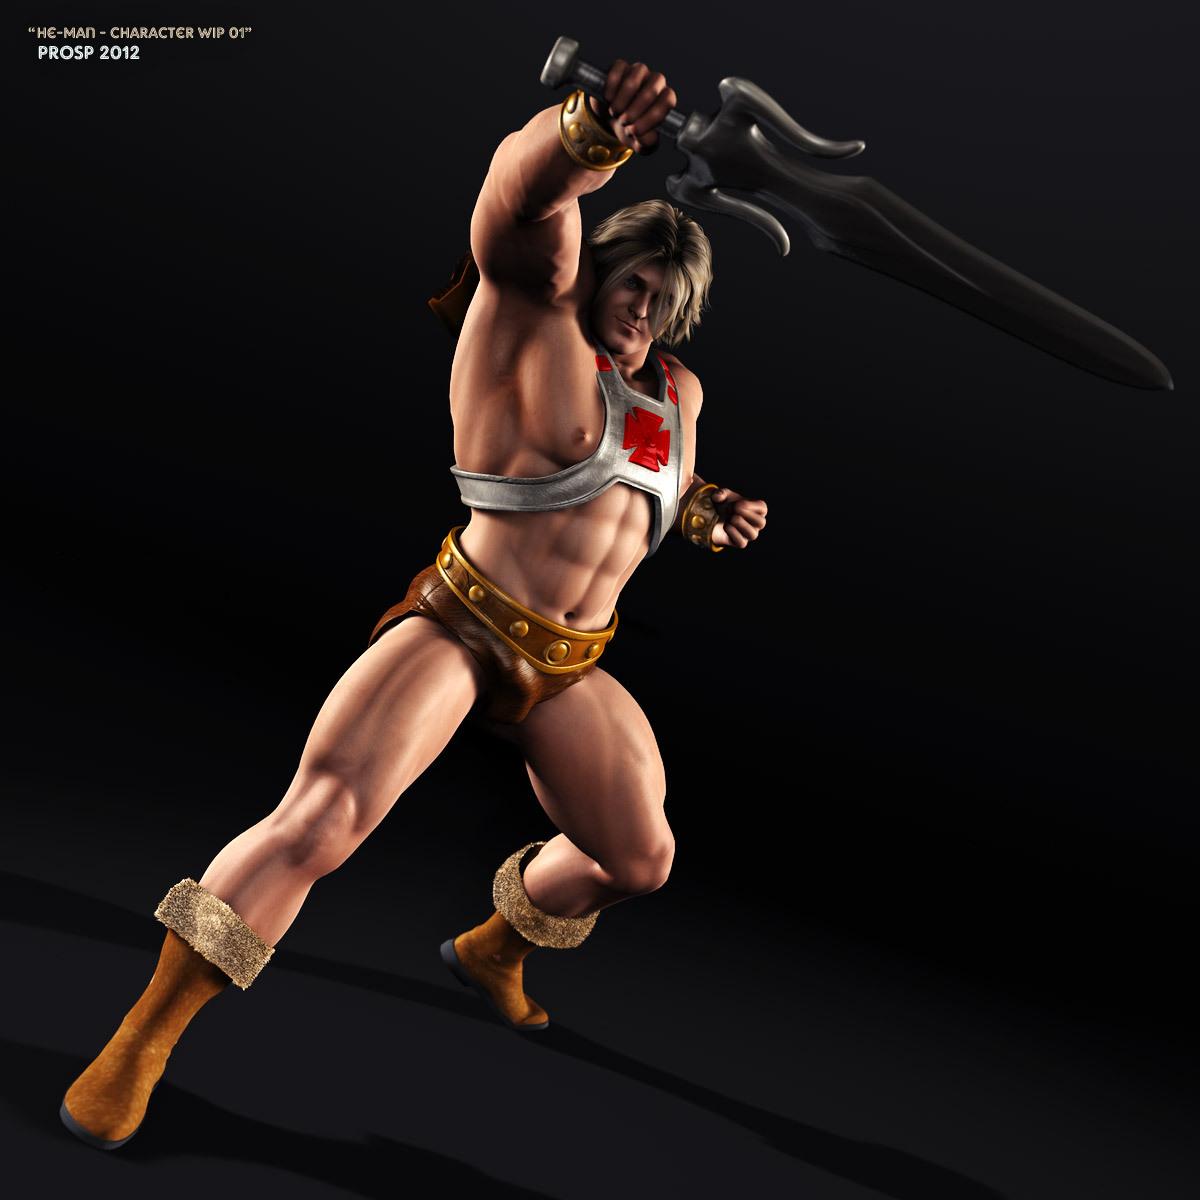 He-Man WIP 01